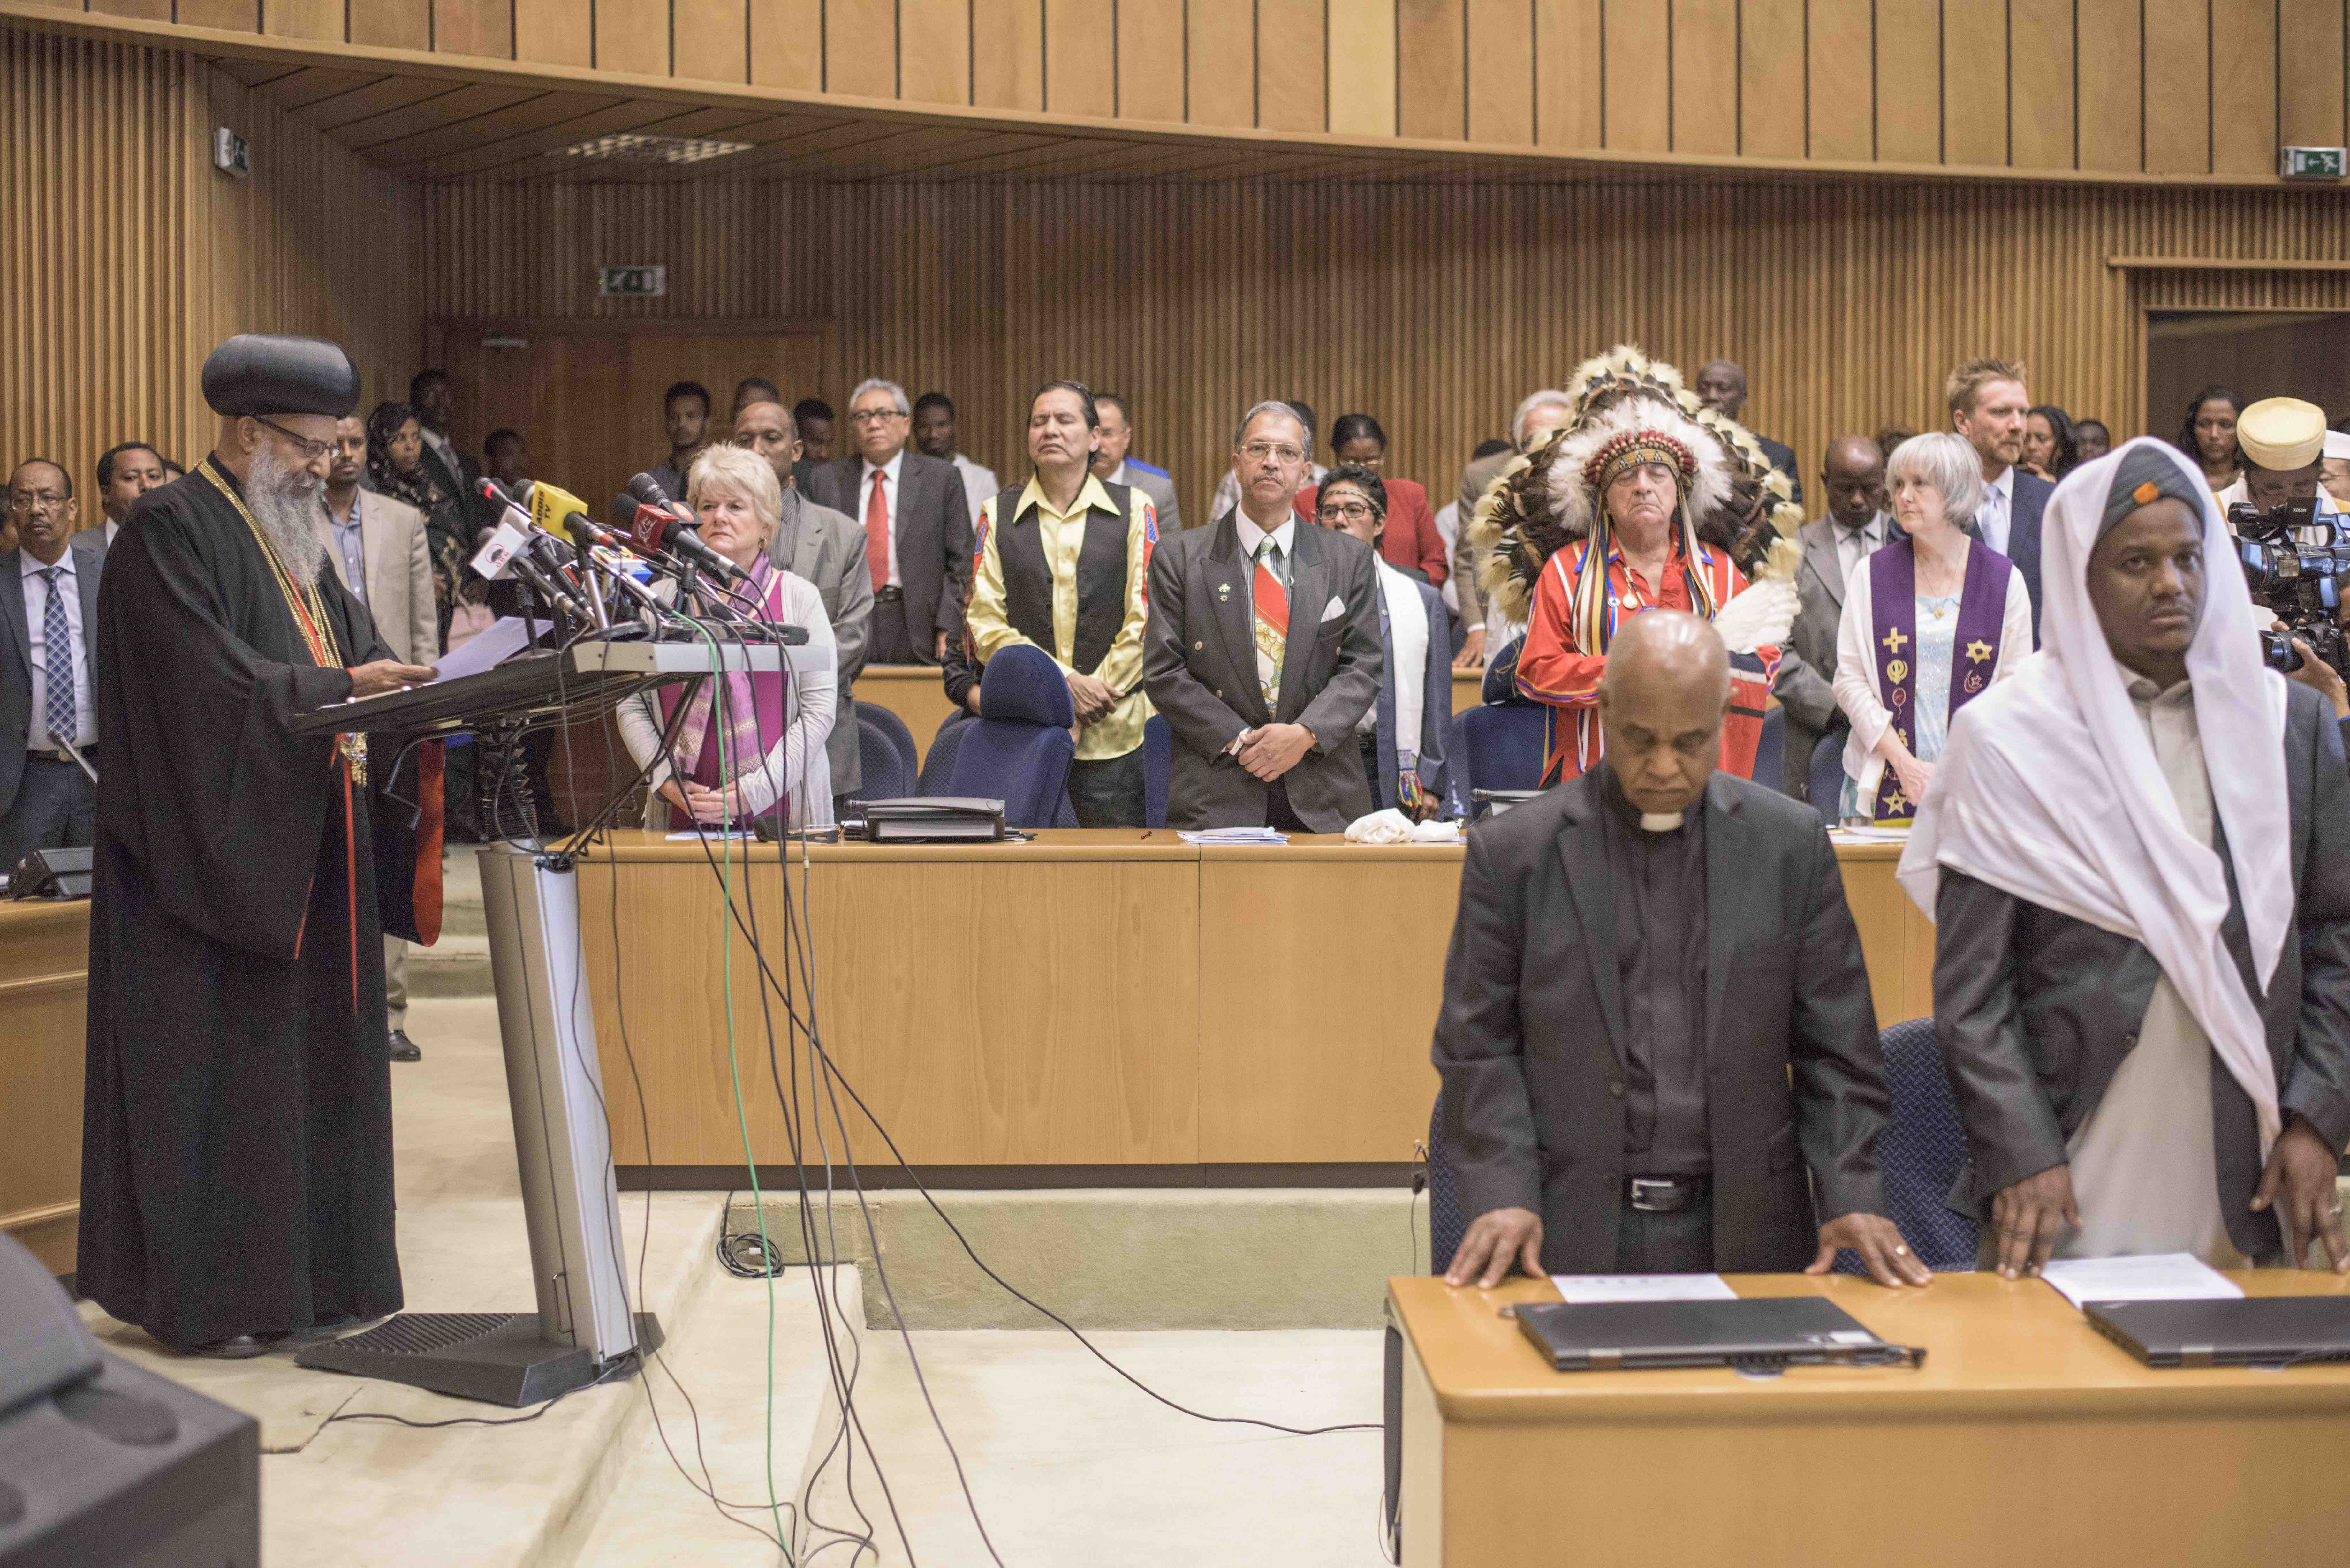 Patriarch Leads AU Prayer-Rajiv (1).jpg